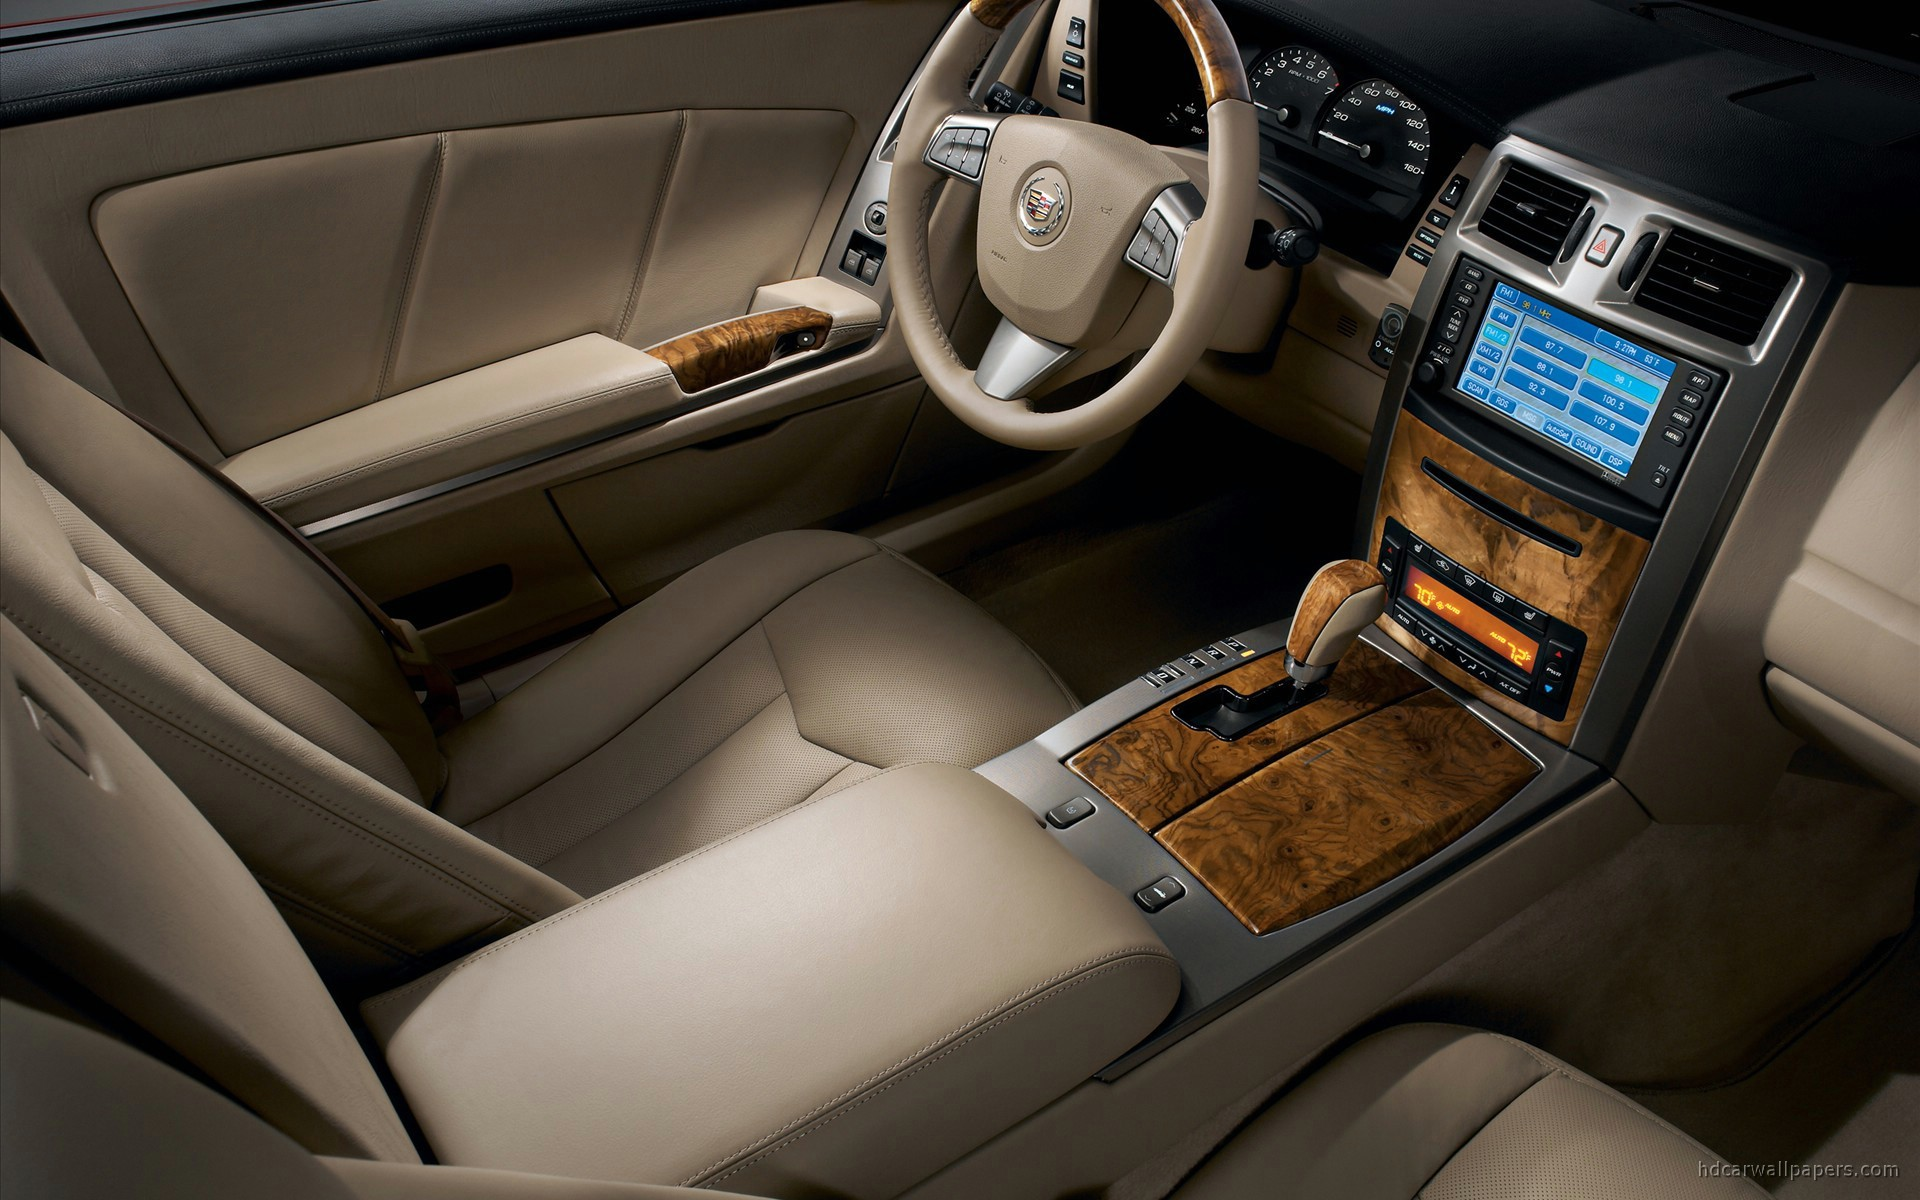 2009 Cadillac XLR Interior Wallpaper | HD Car Wallpapers ...